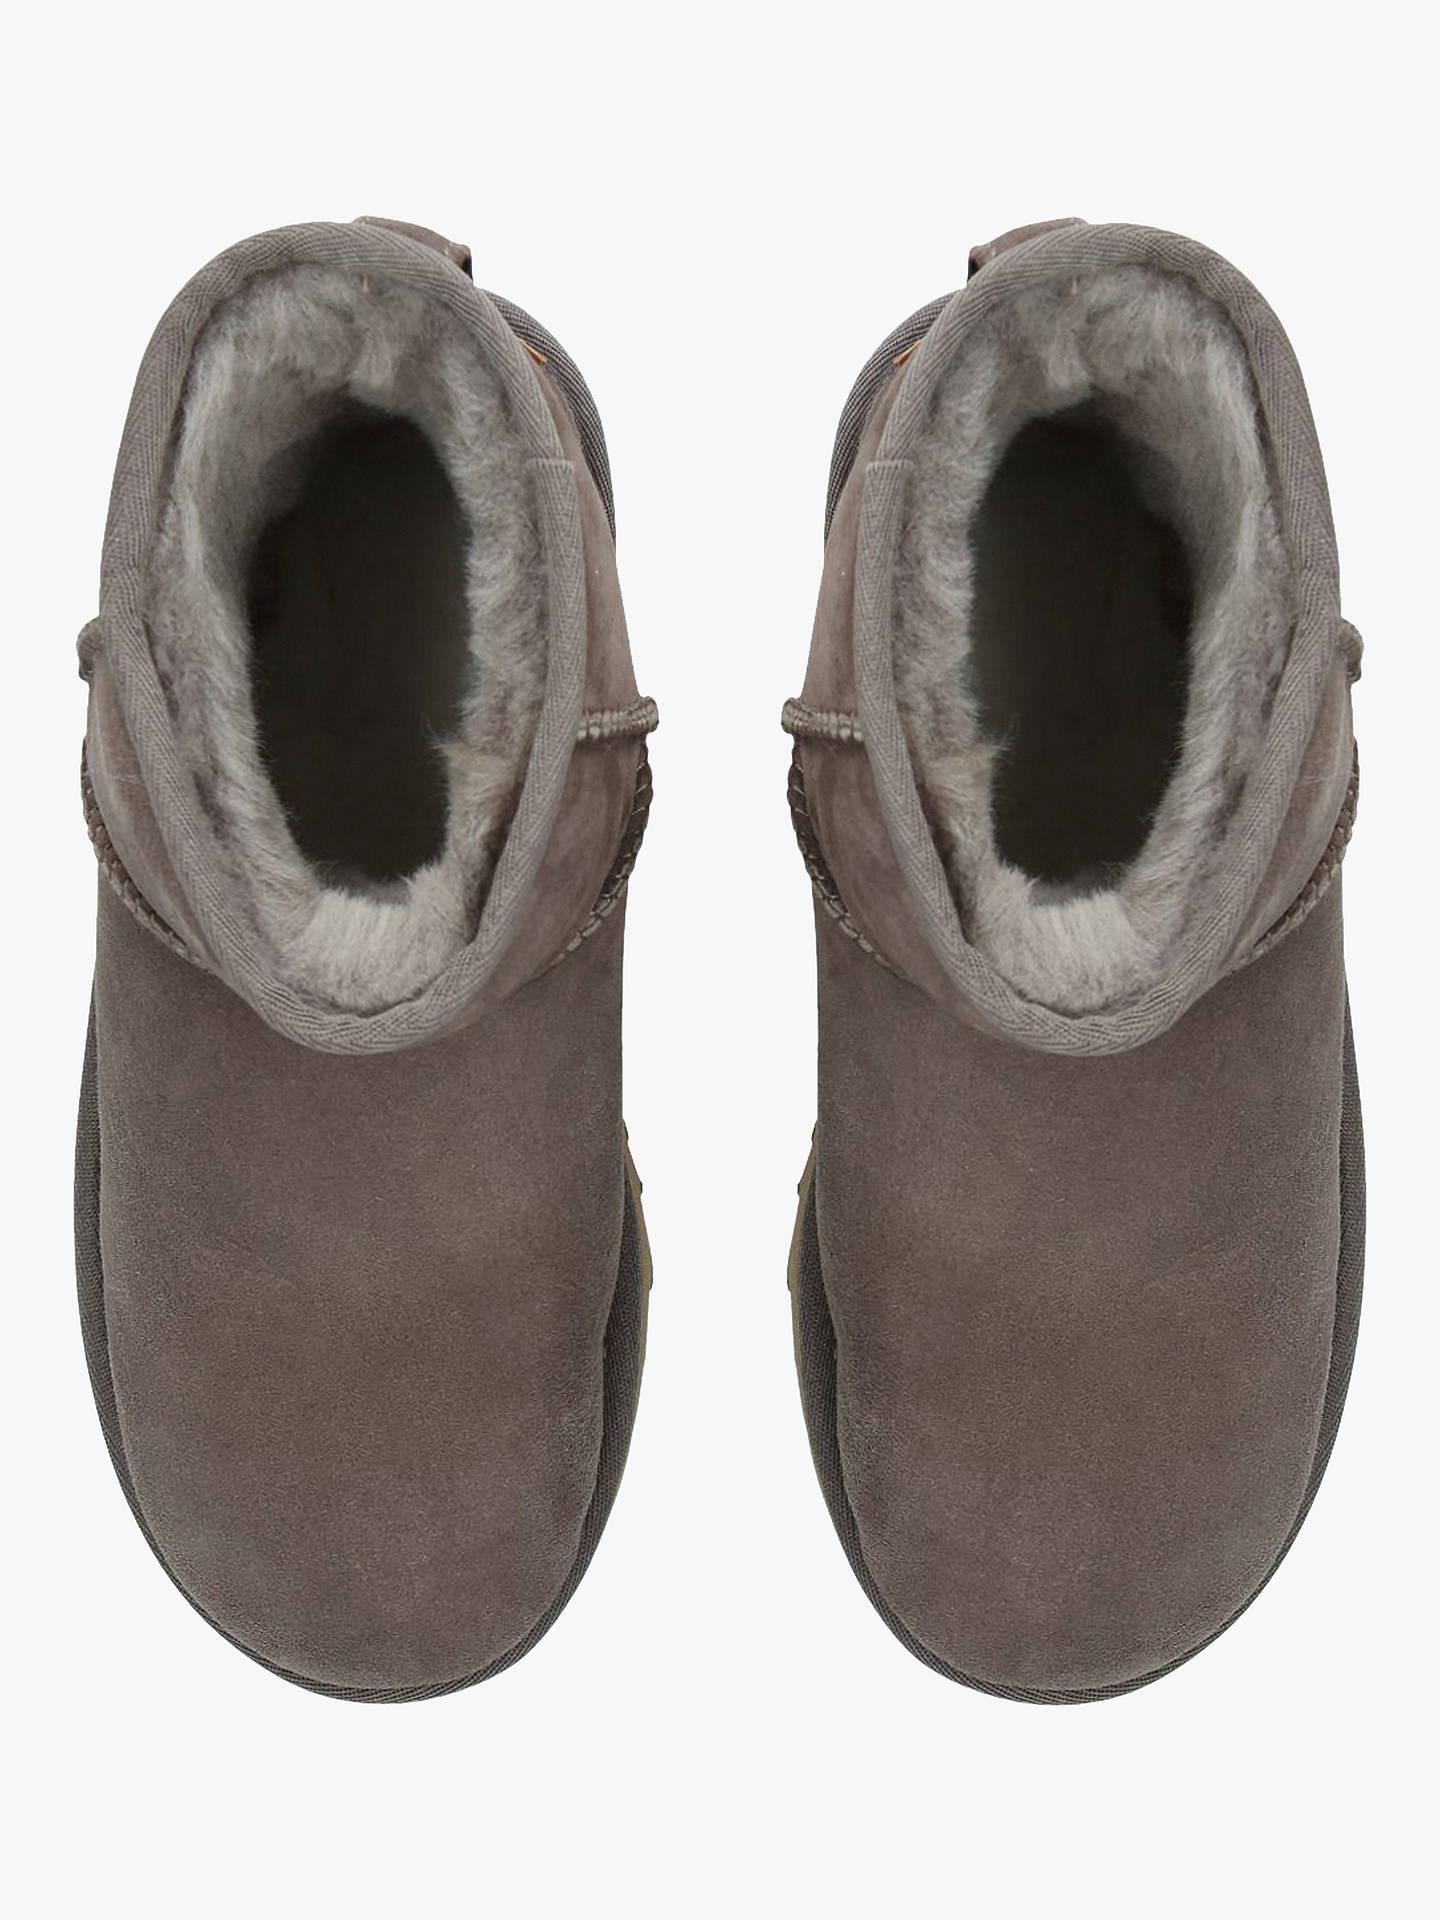 2c045d8fee6 UGG Classic II Mini Sheepskin Ankle Boots, Natural Taupe